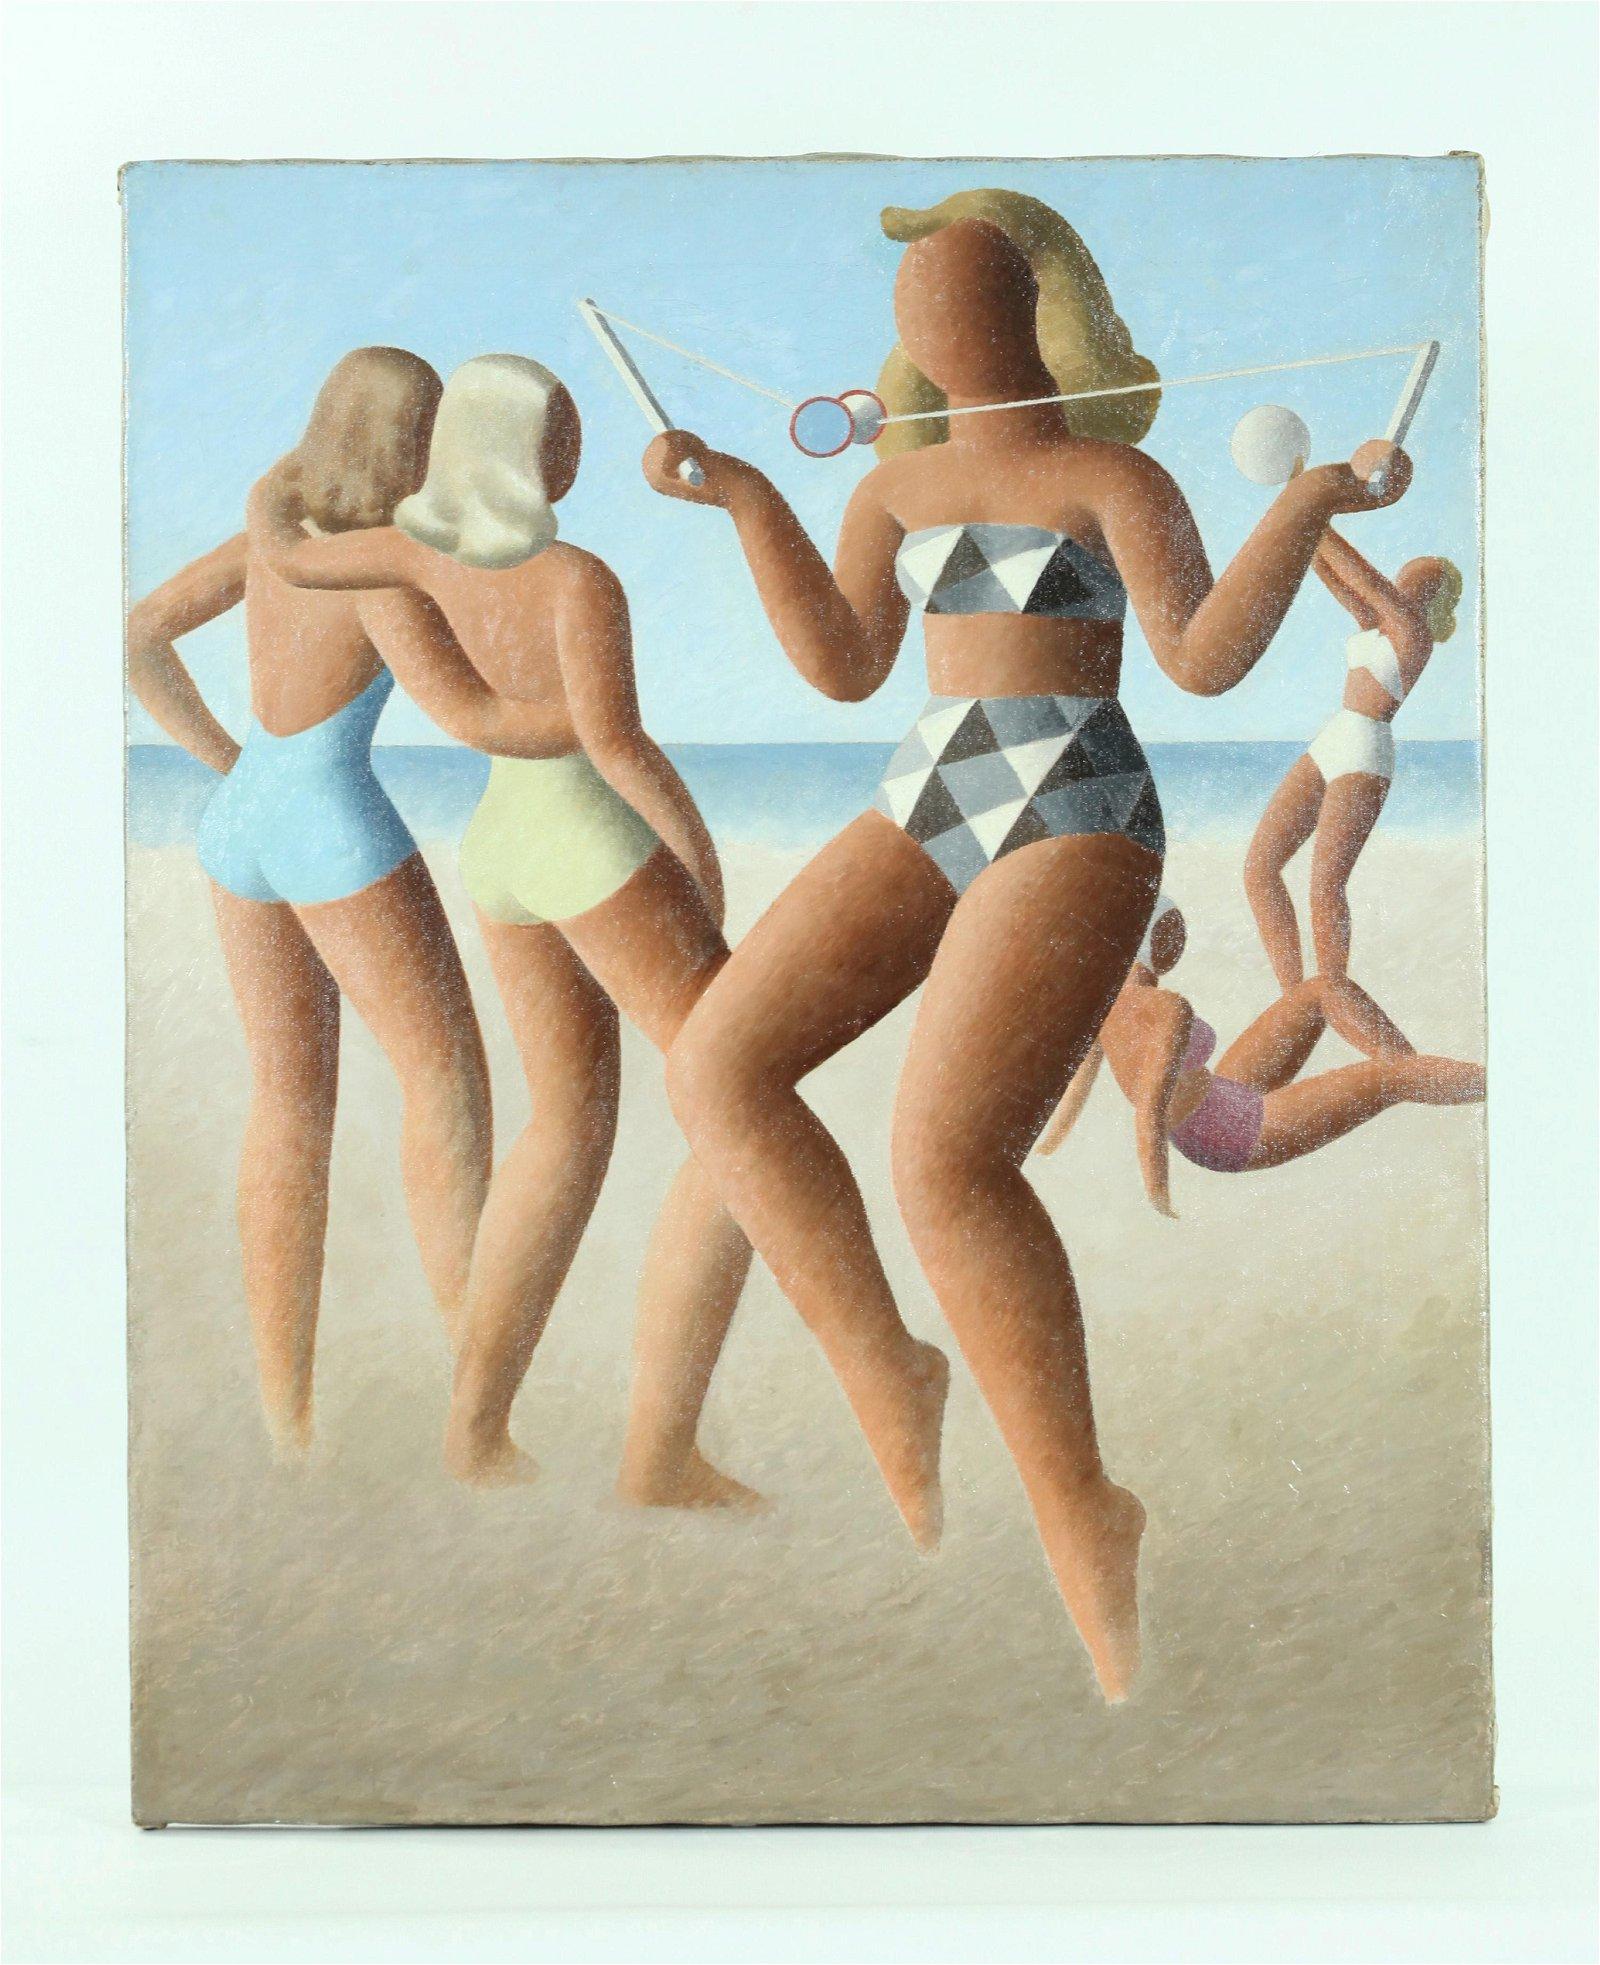 Surrealist Ladies in Bathing Suits; Oil canvas